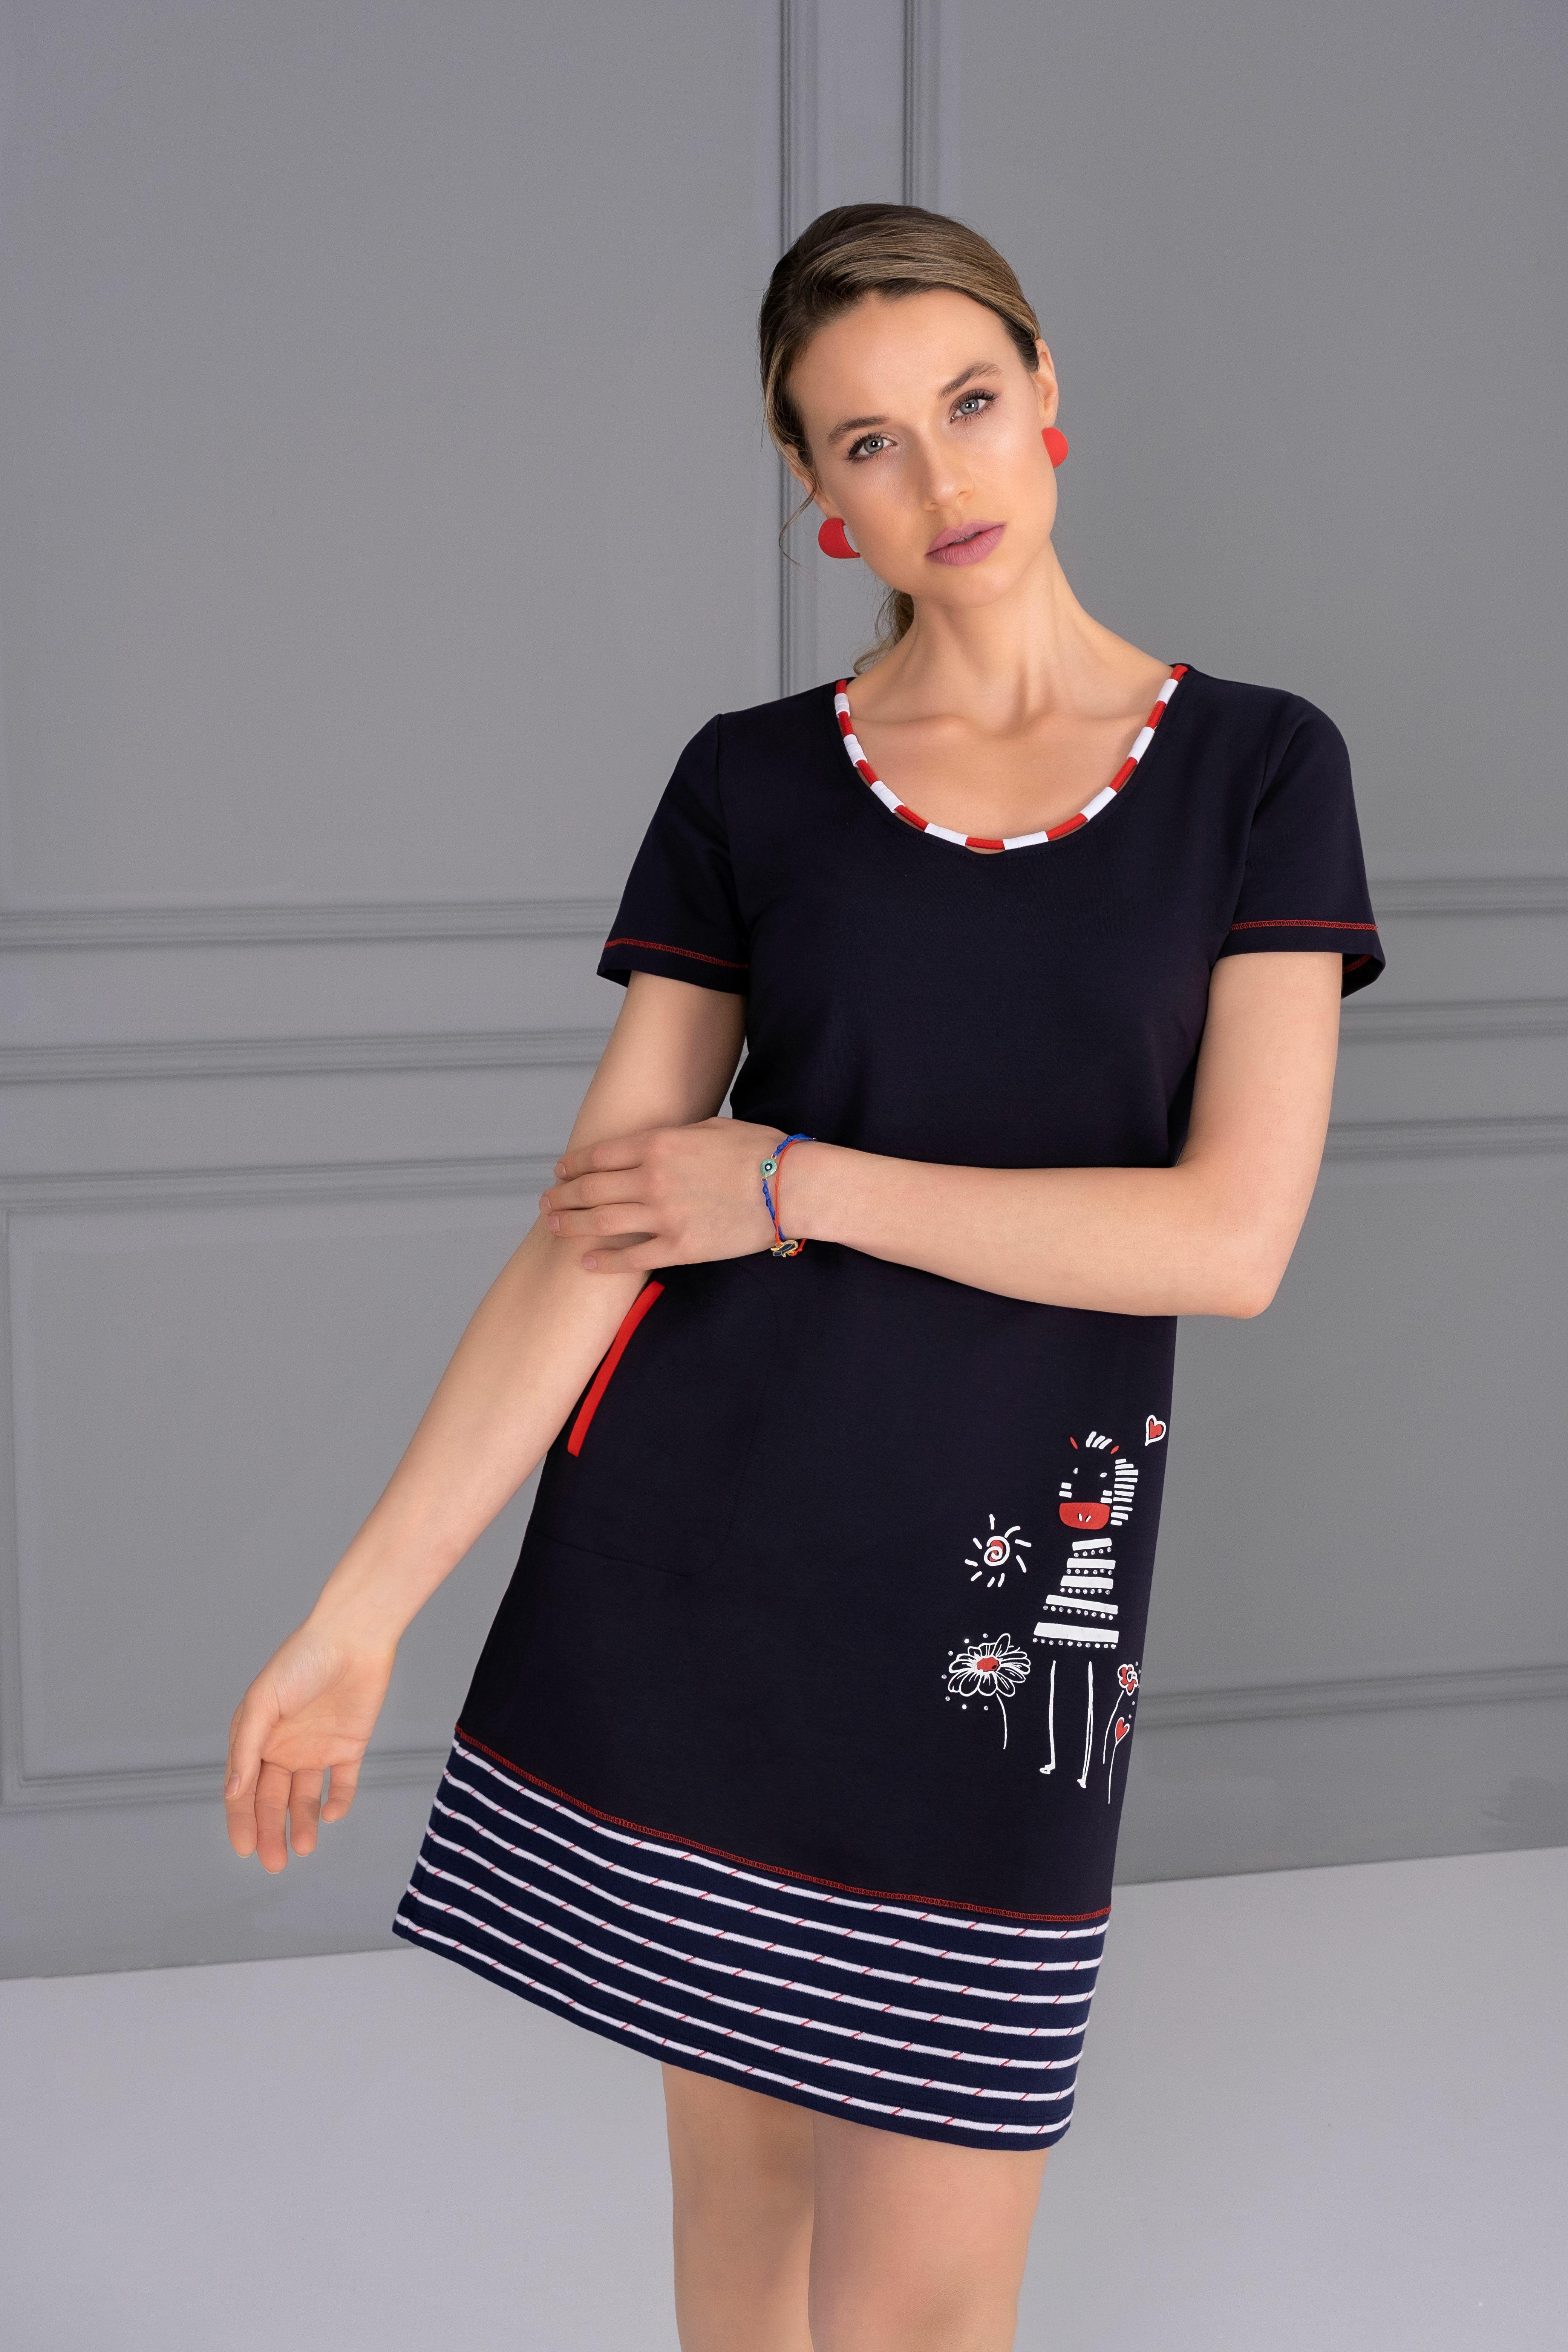 Dolcezza: Humour Me In Navy Art Pocket Dress (Few Left!) Dolcezza_21108